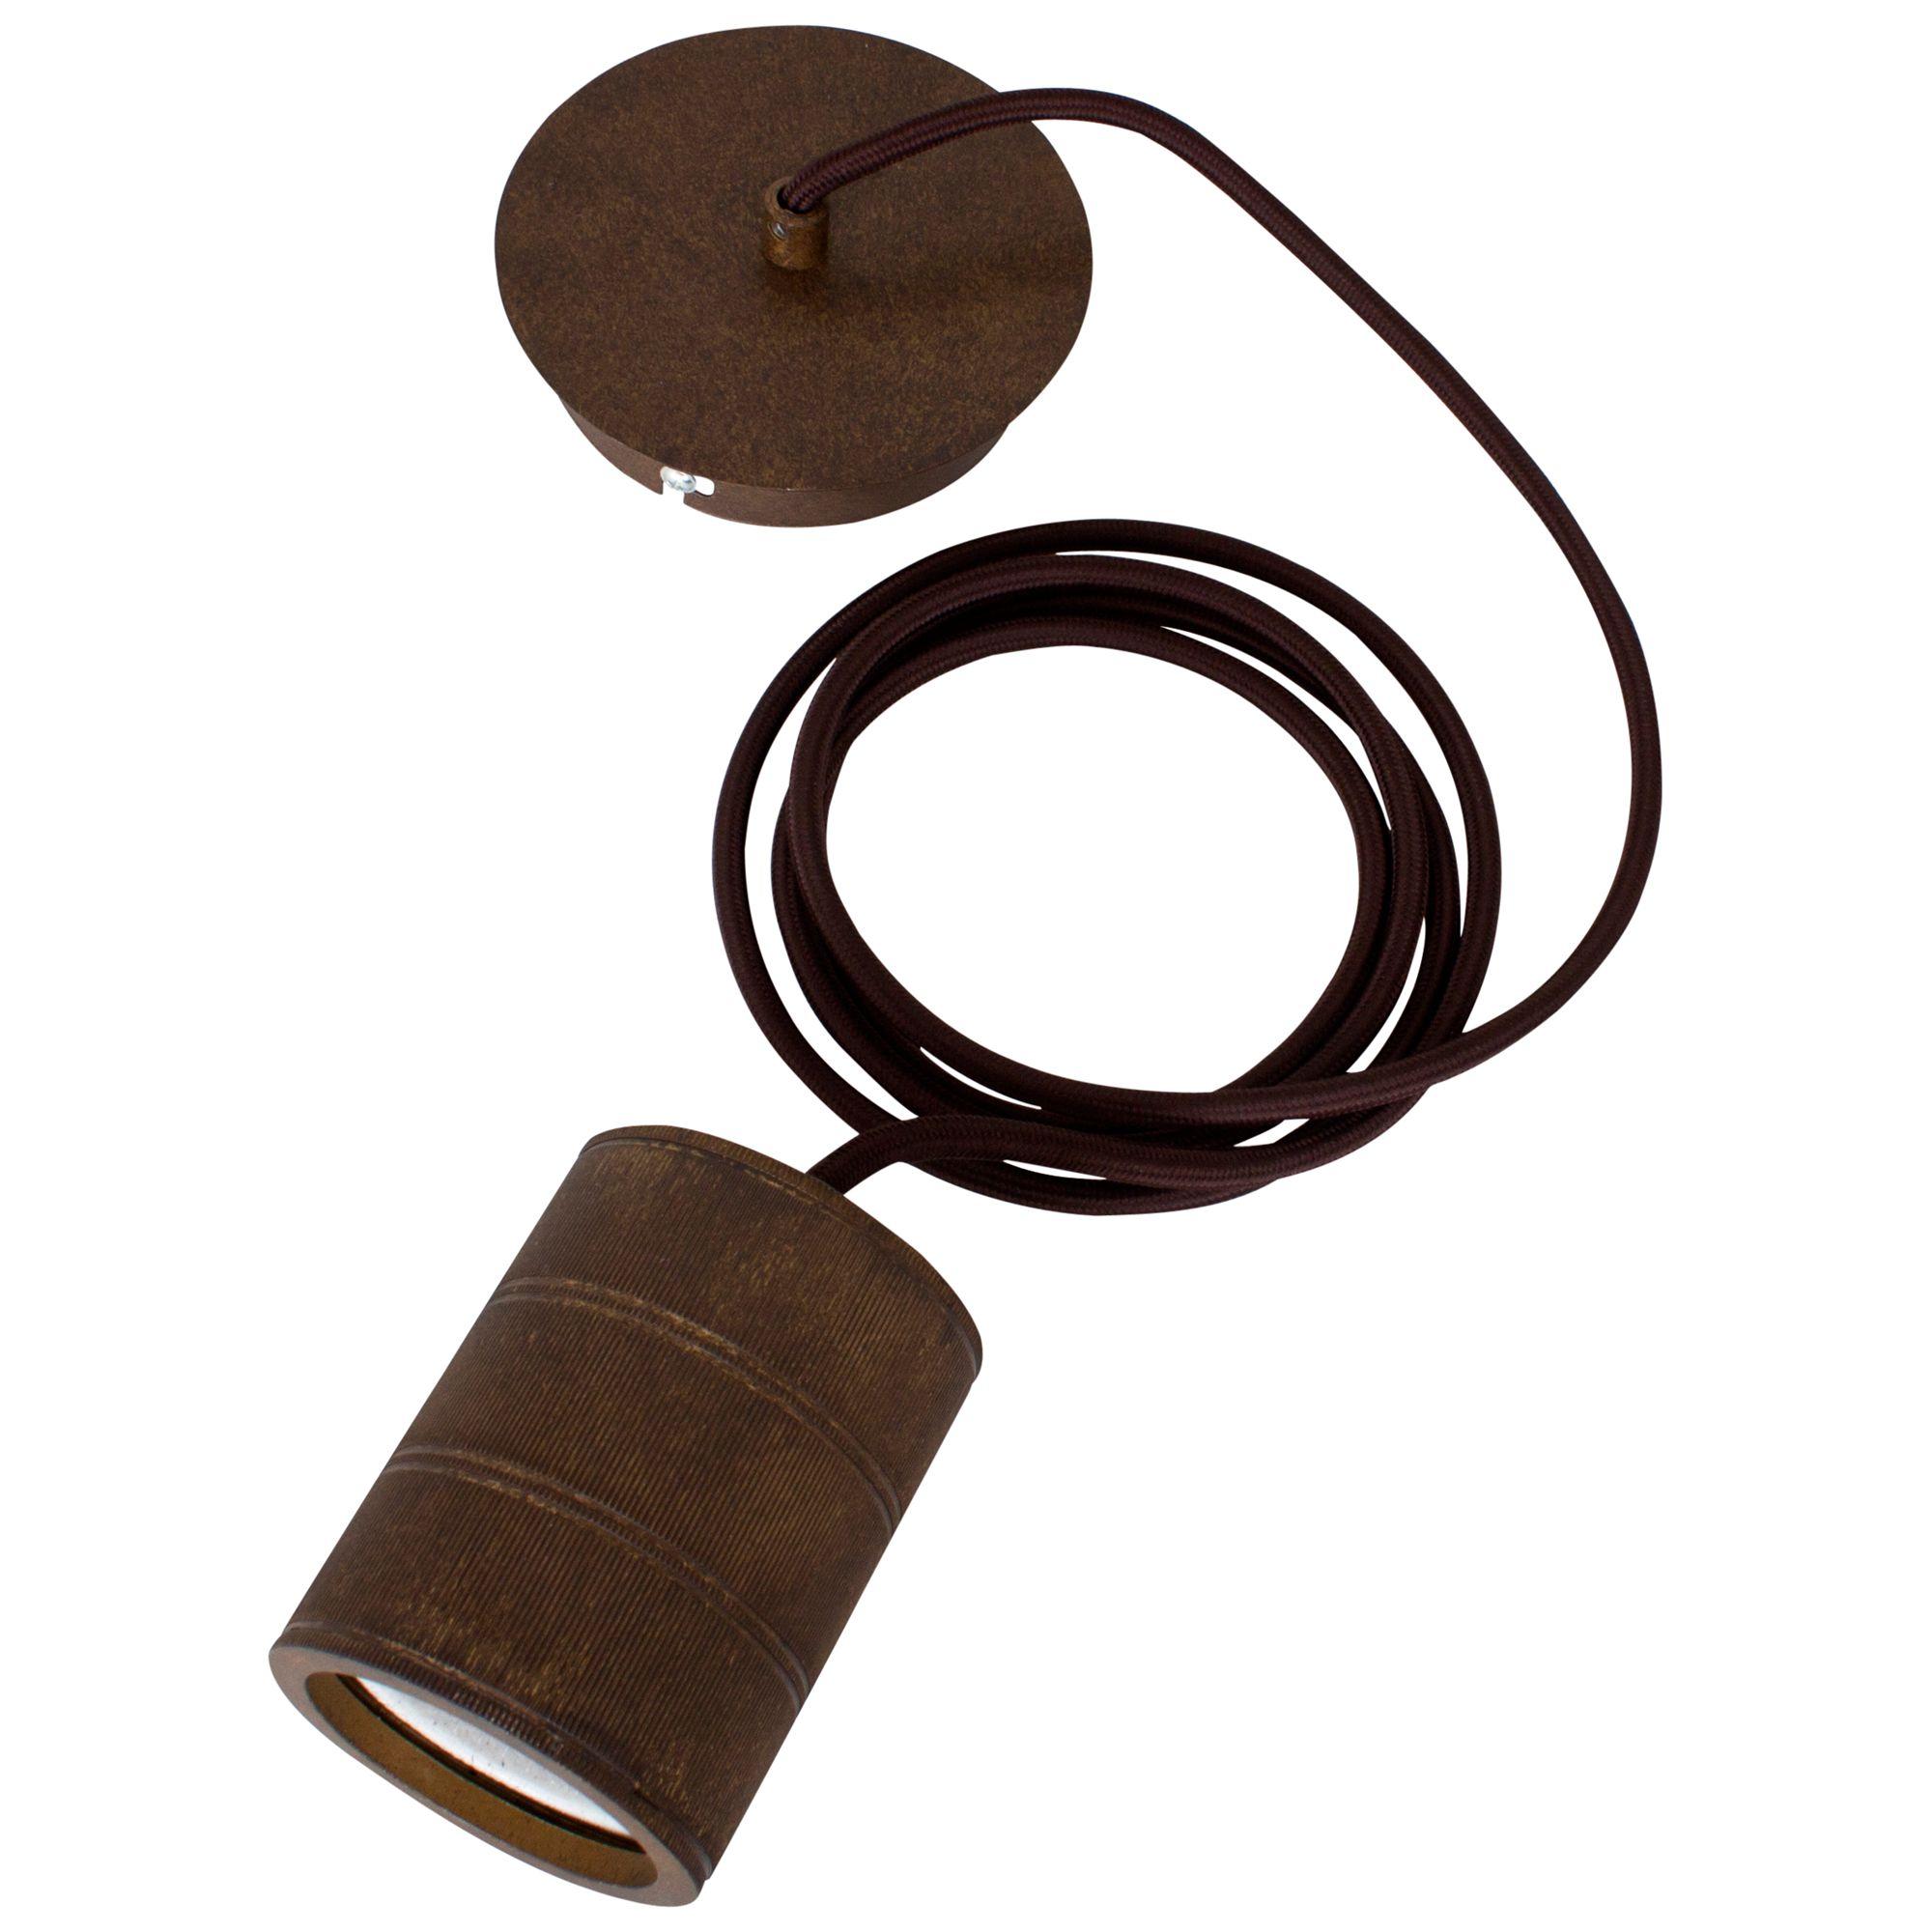 Calex Calex E40 XXL Retro Pendant Cord, Antique Bronze